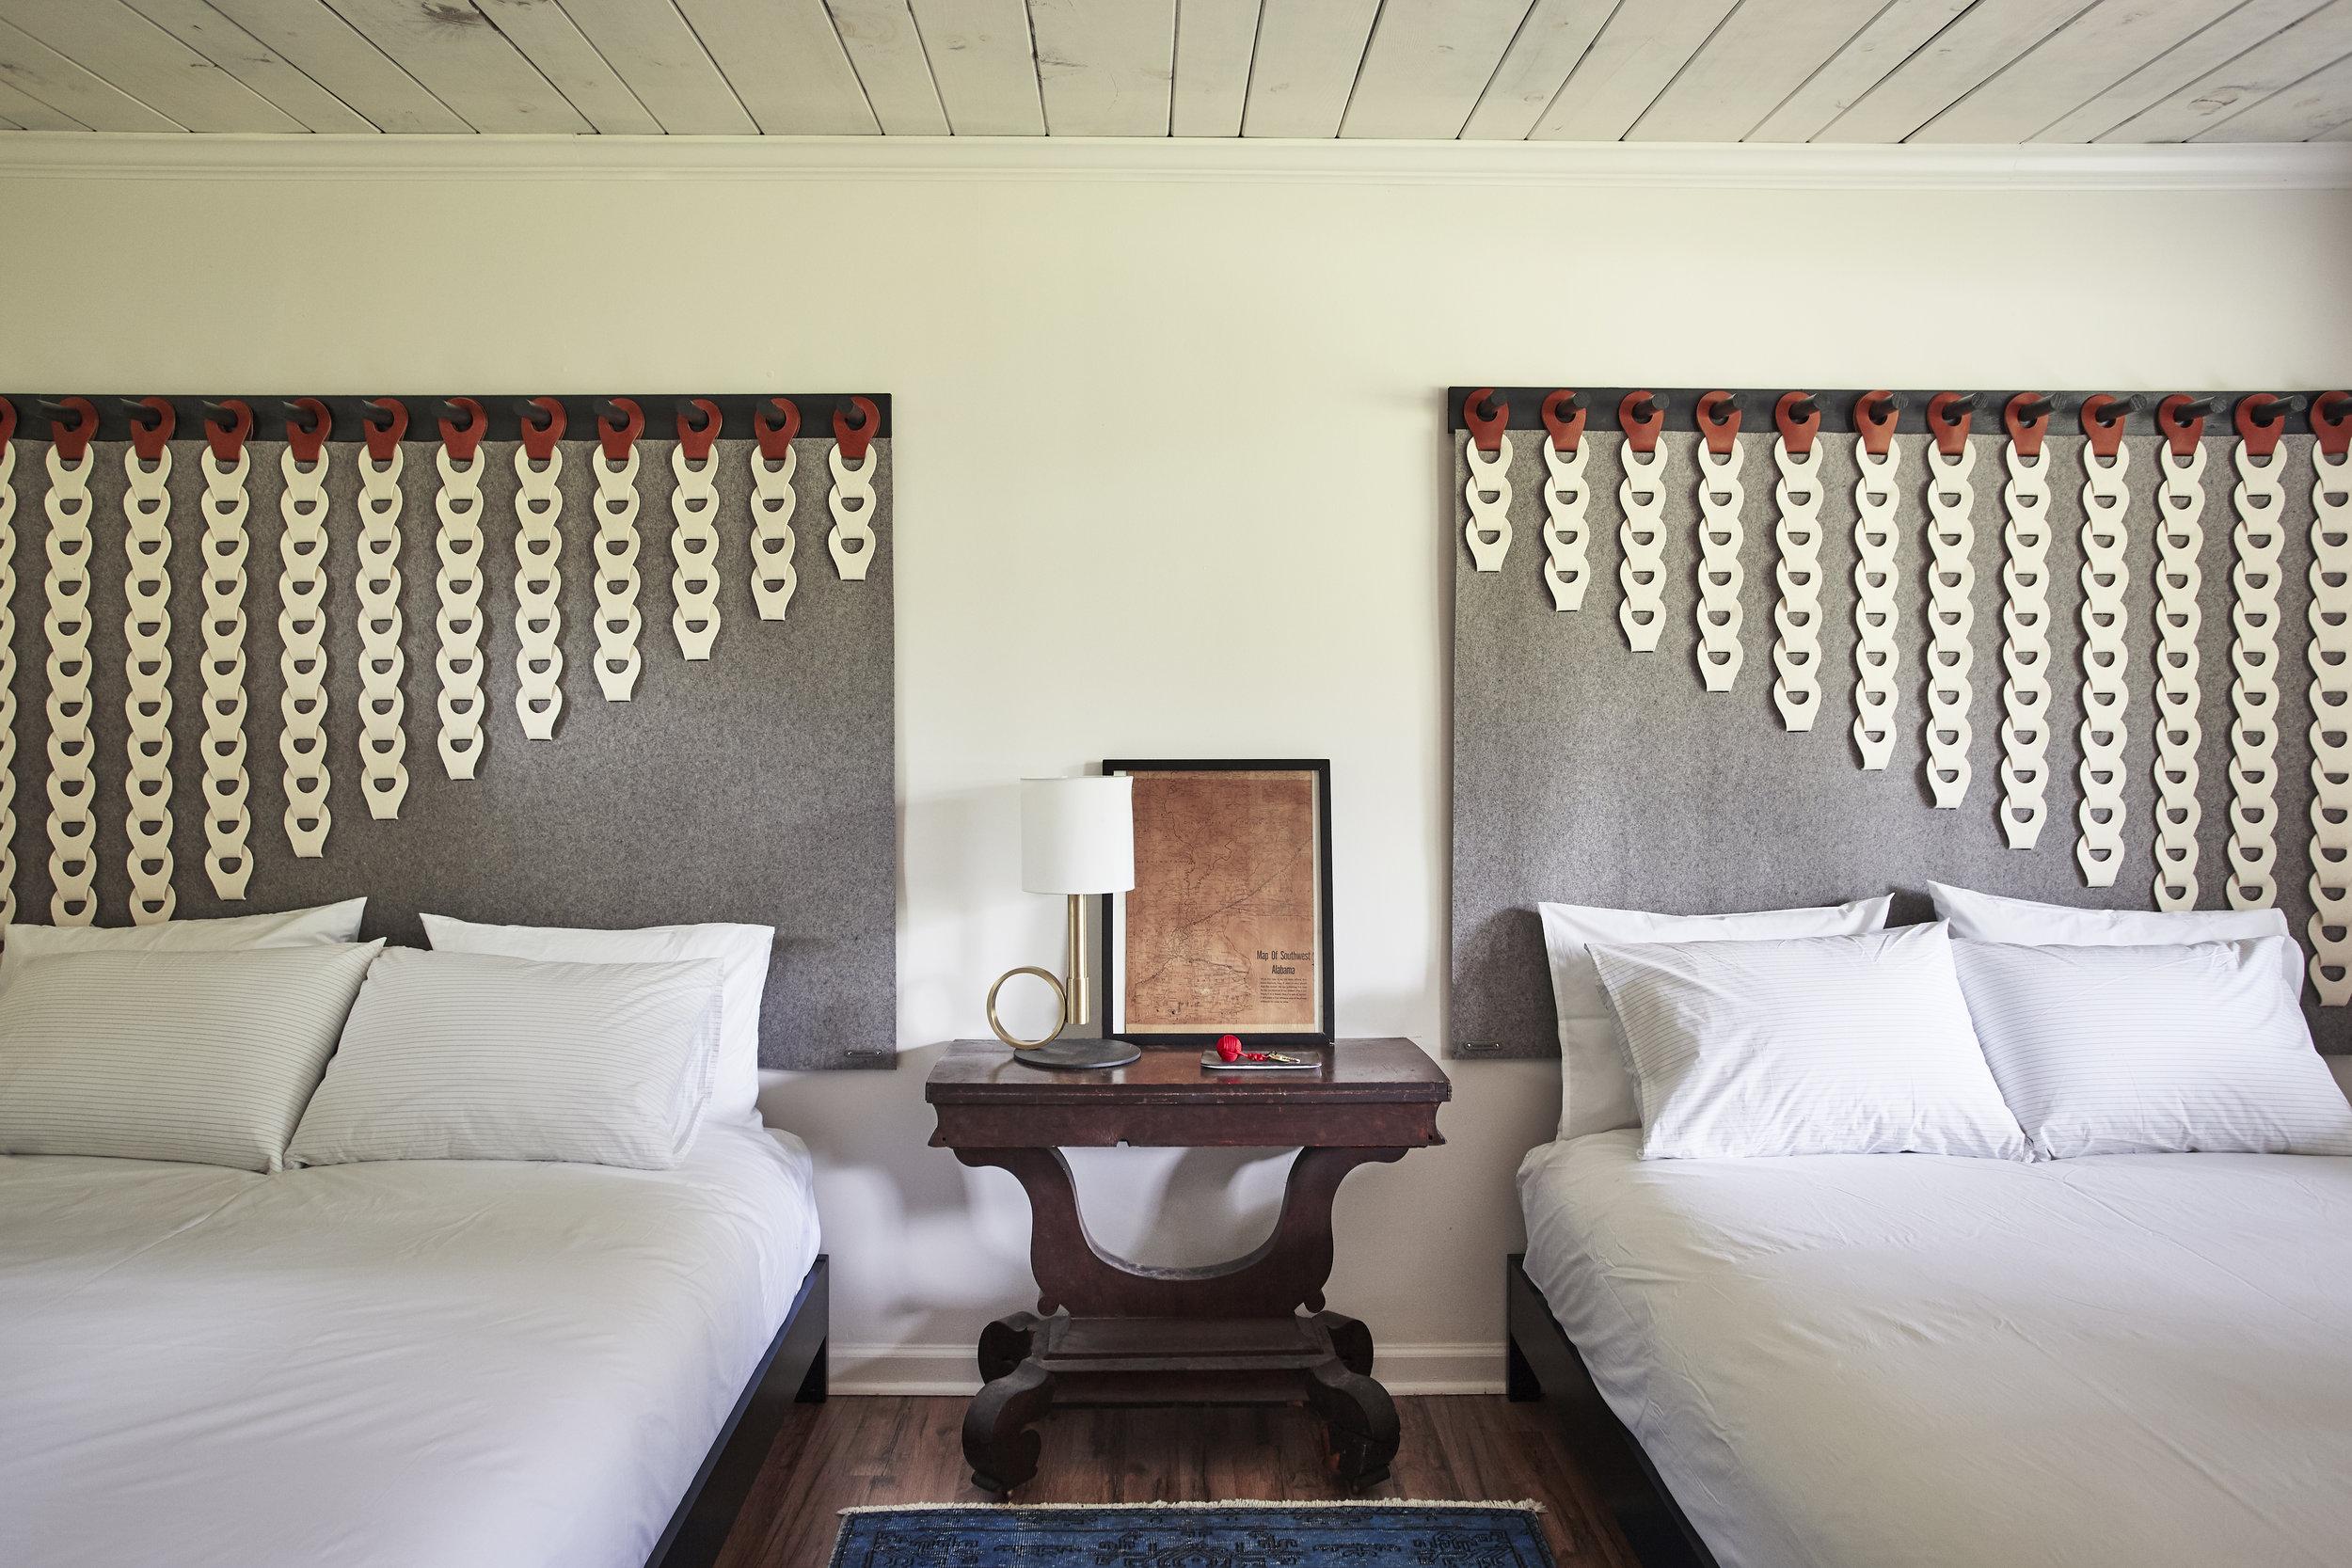 Icarus Tapestries  In Grey and Cream : Megan Pflug Interior Design - The Woodhouse Lodge | Photo: Genevieve Garruppo